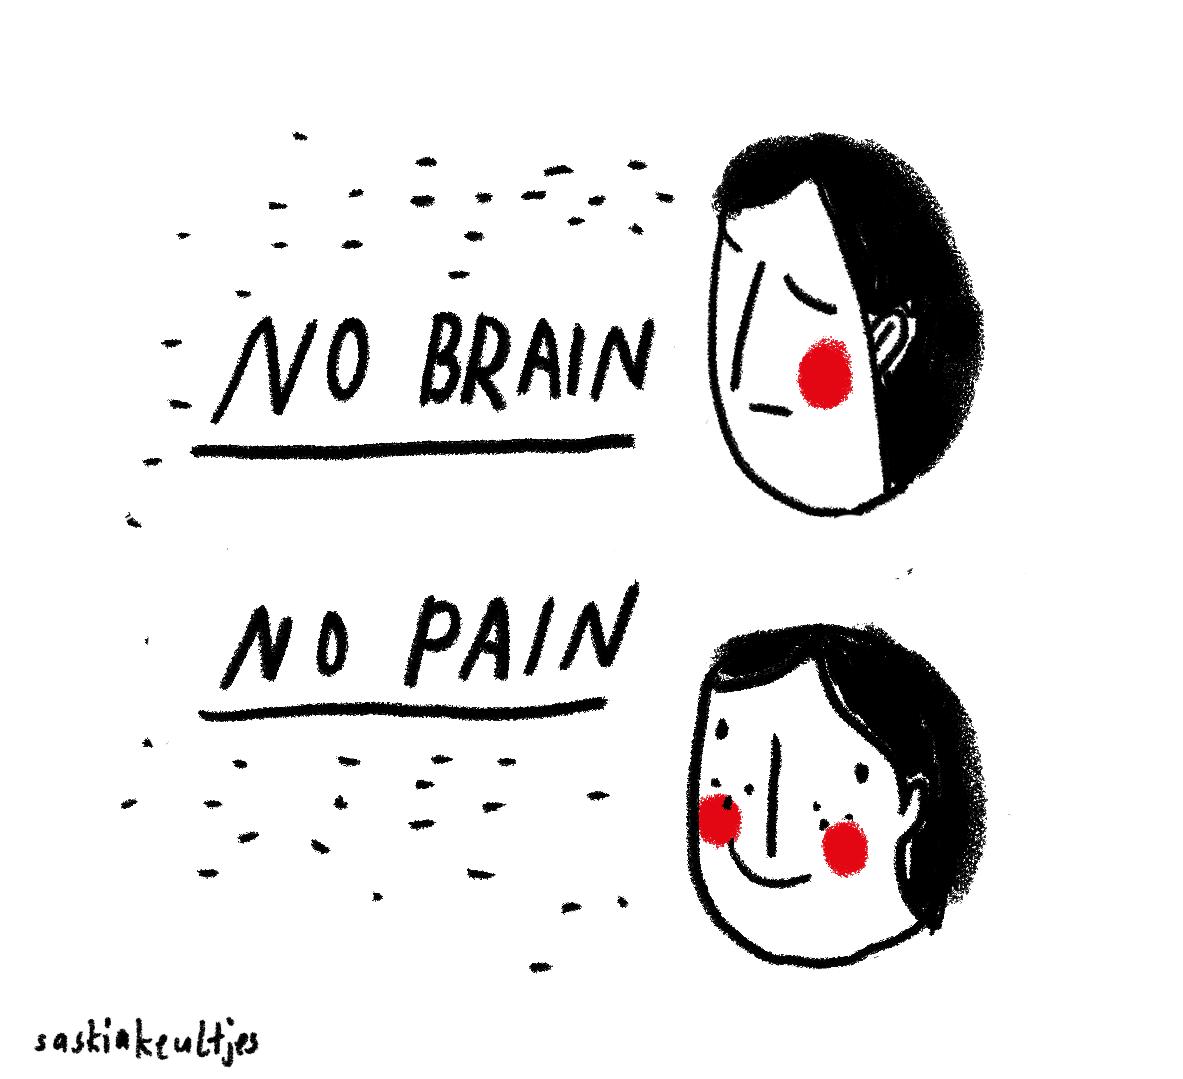 nobrainnopain